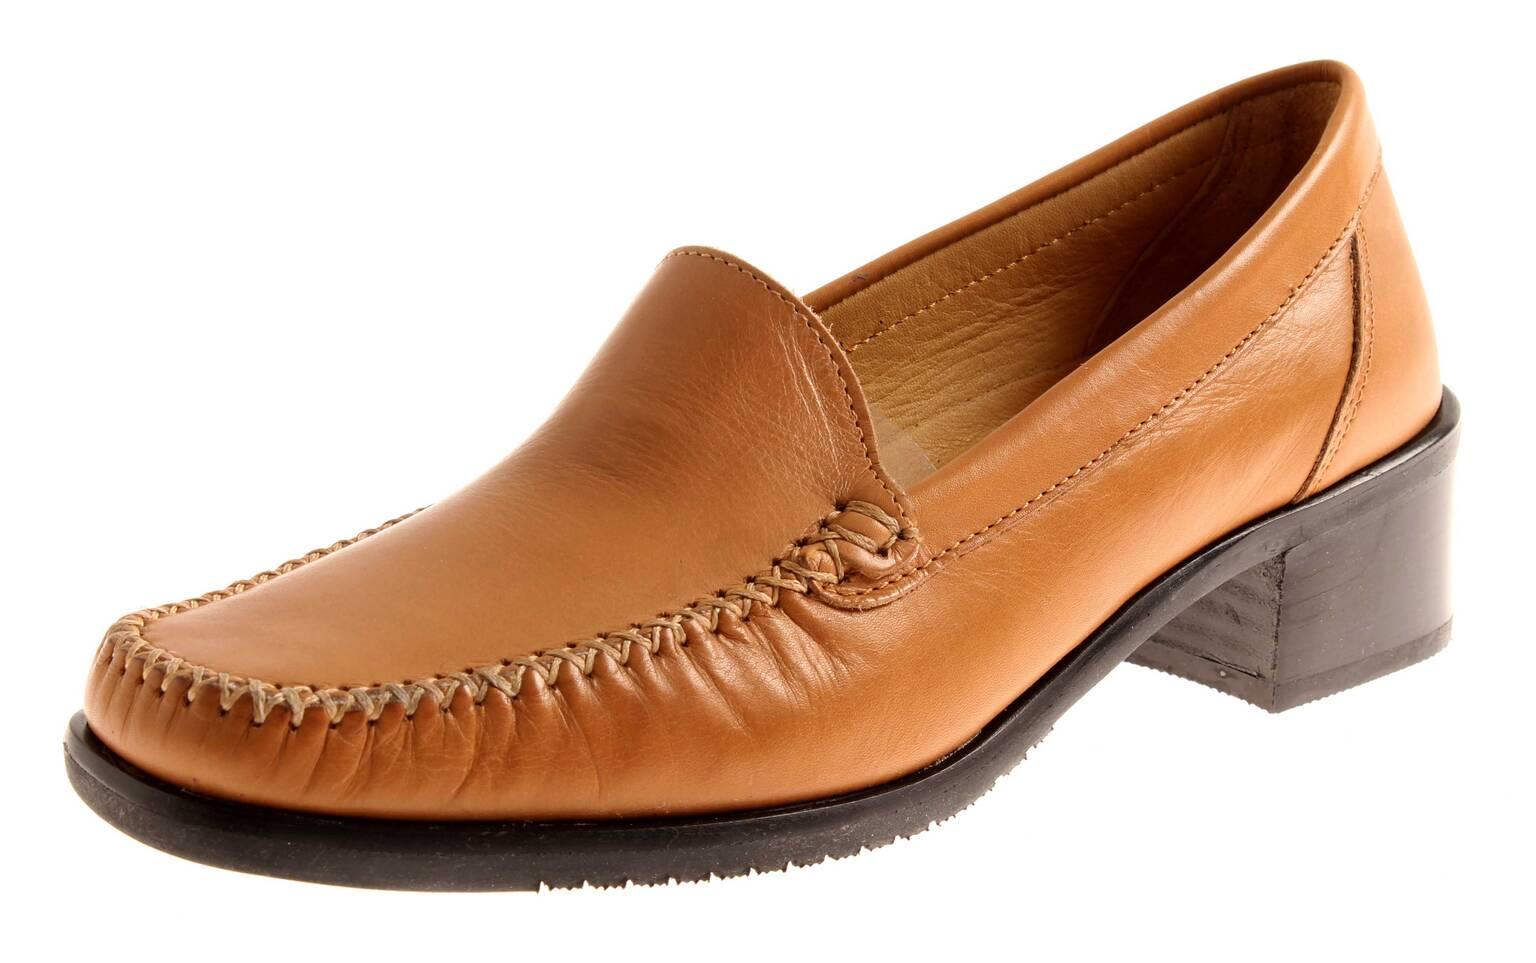 Chelman Pantofola Scarpe di cuoio scarpe basse pelle scarpe donna pelle basse   25c0ca